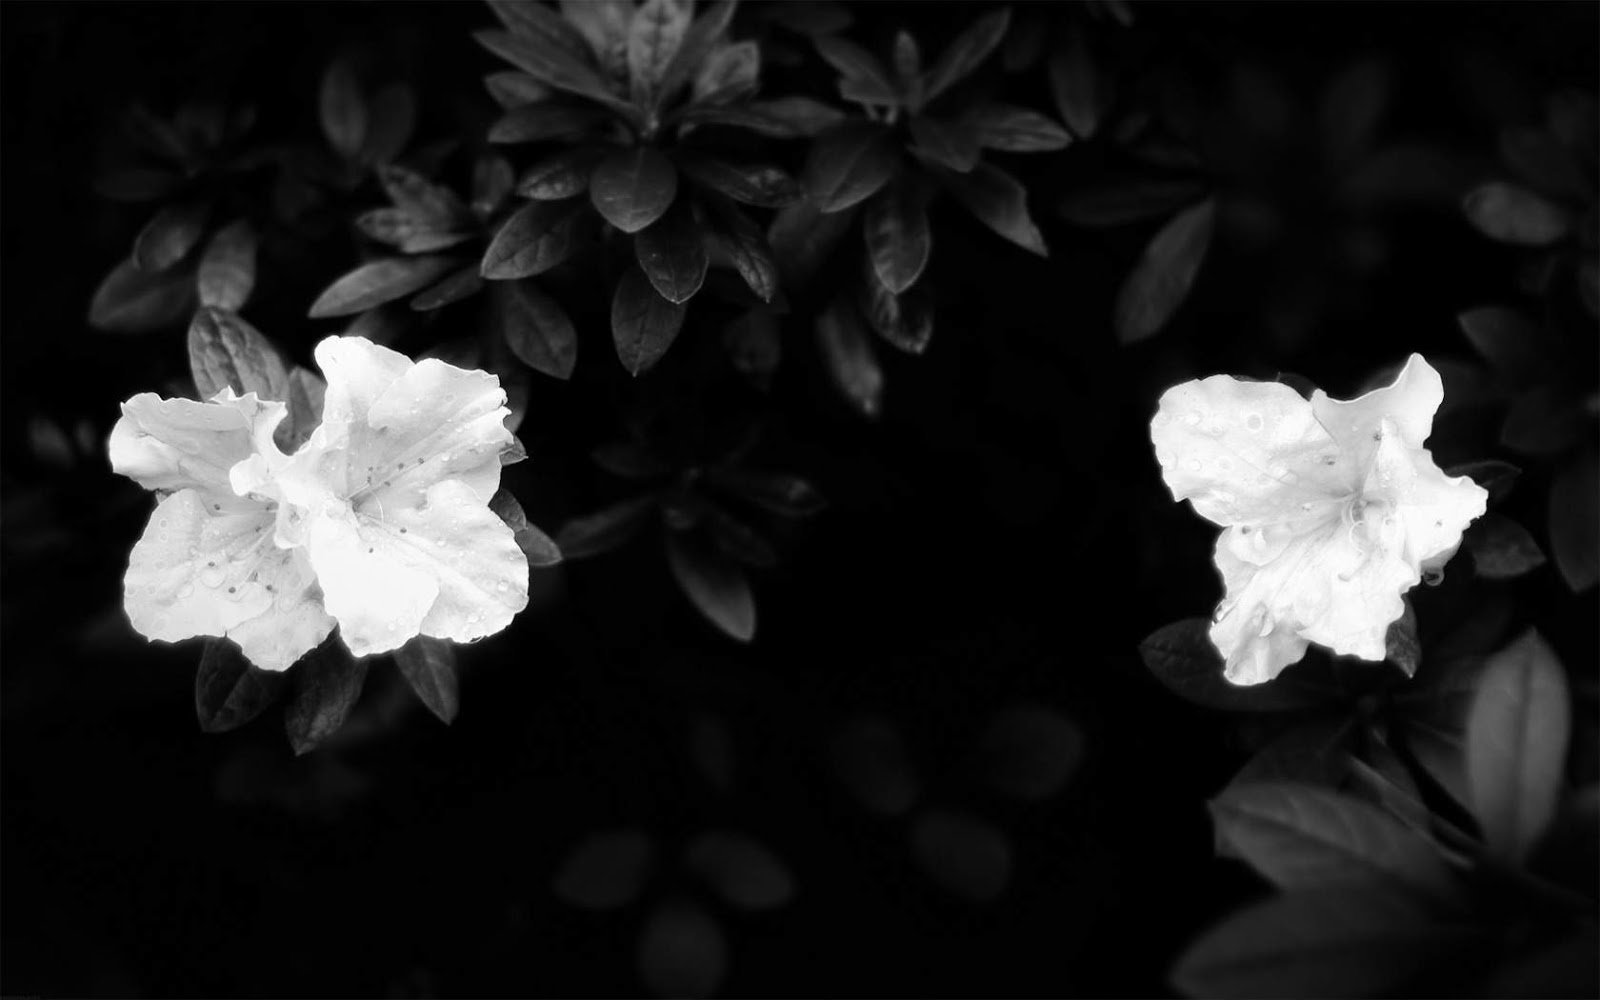 49 Black Wallpaper With White Flowers On Wallpapersafari